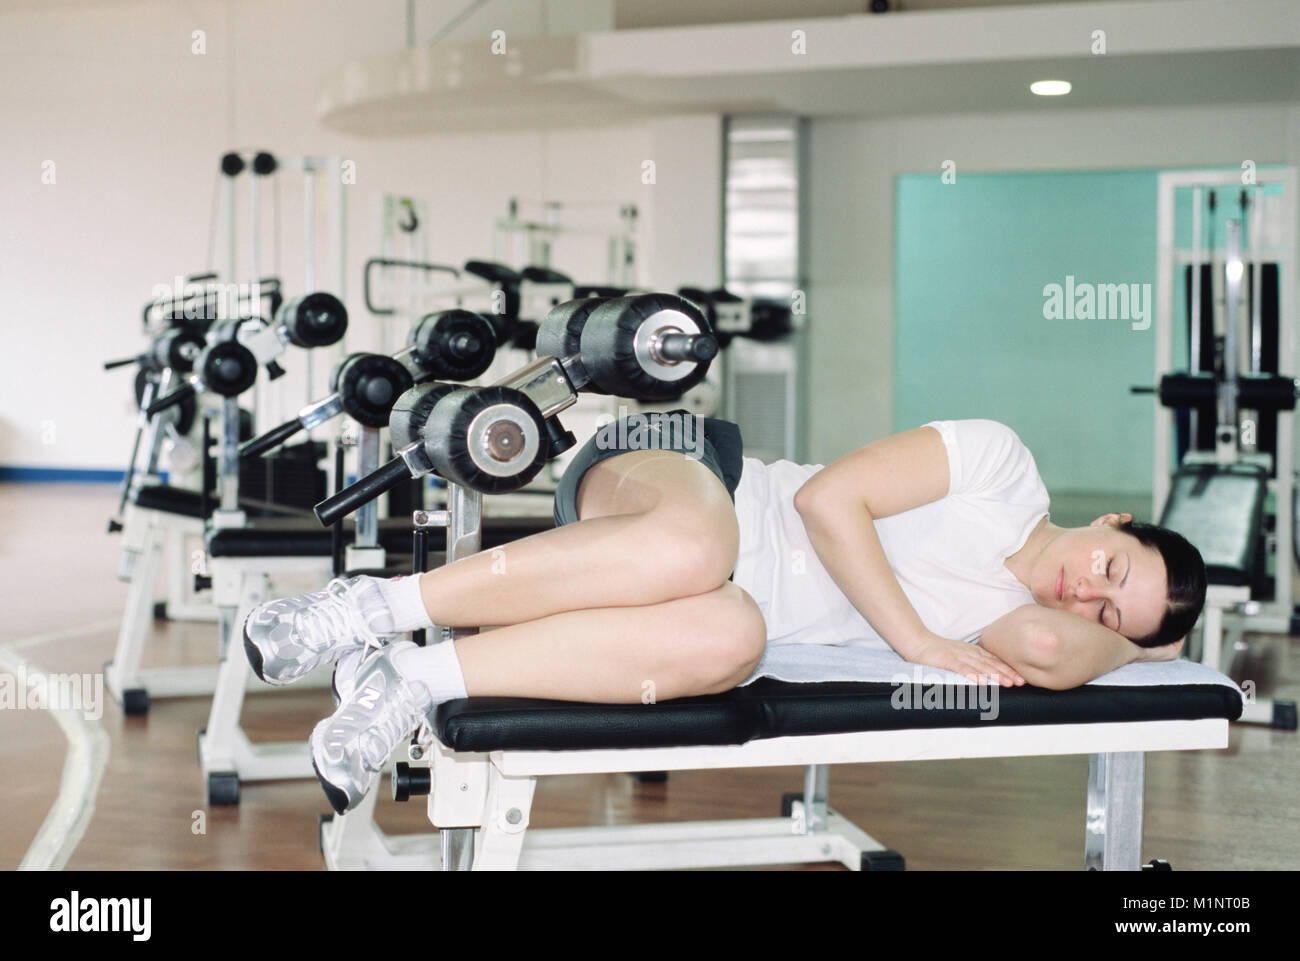 Jeune femme dormir dans la salle de sport Photo Stock